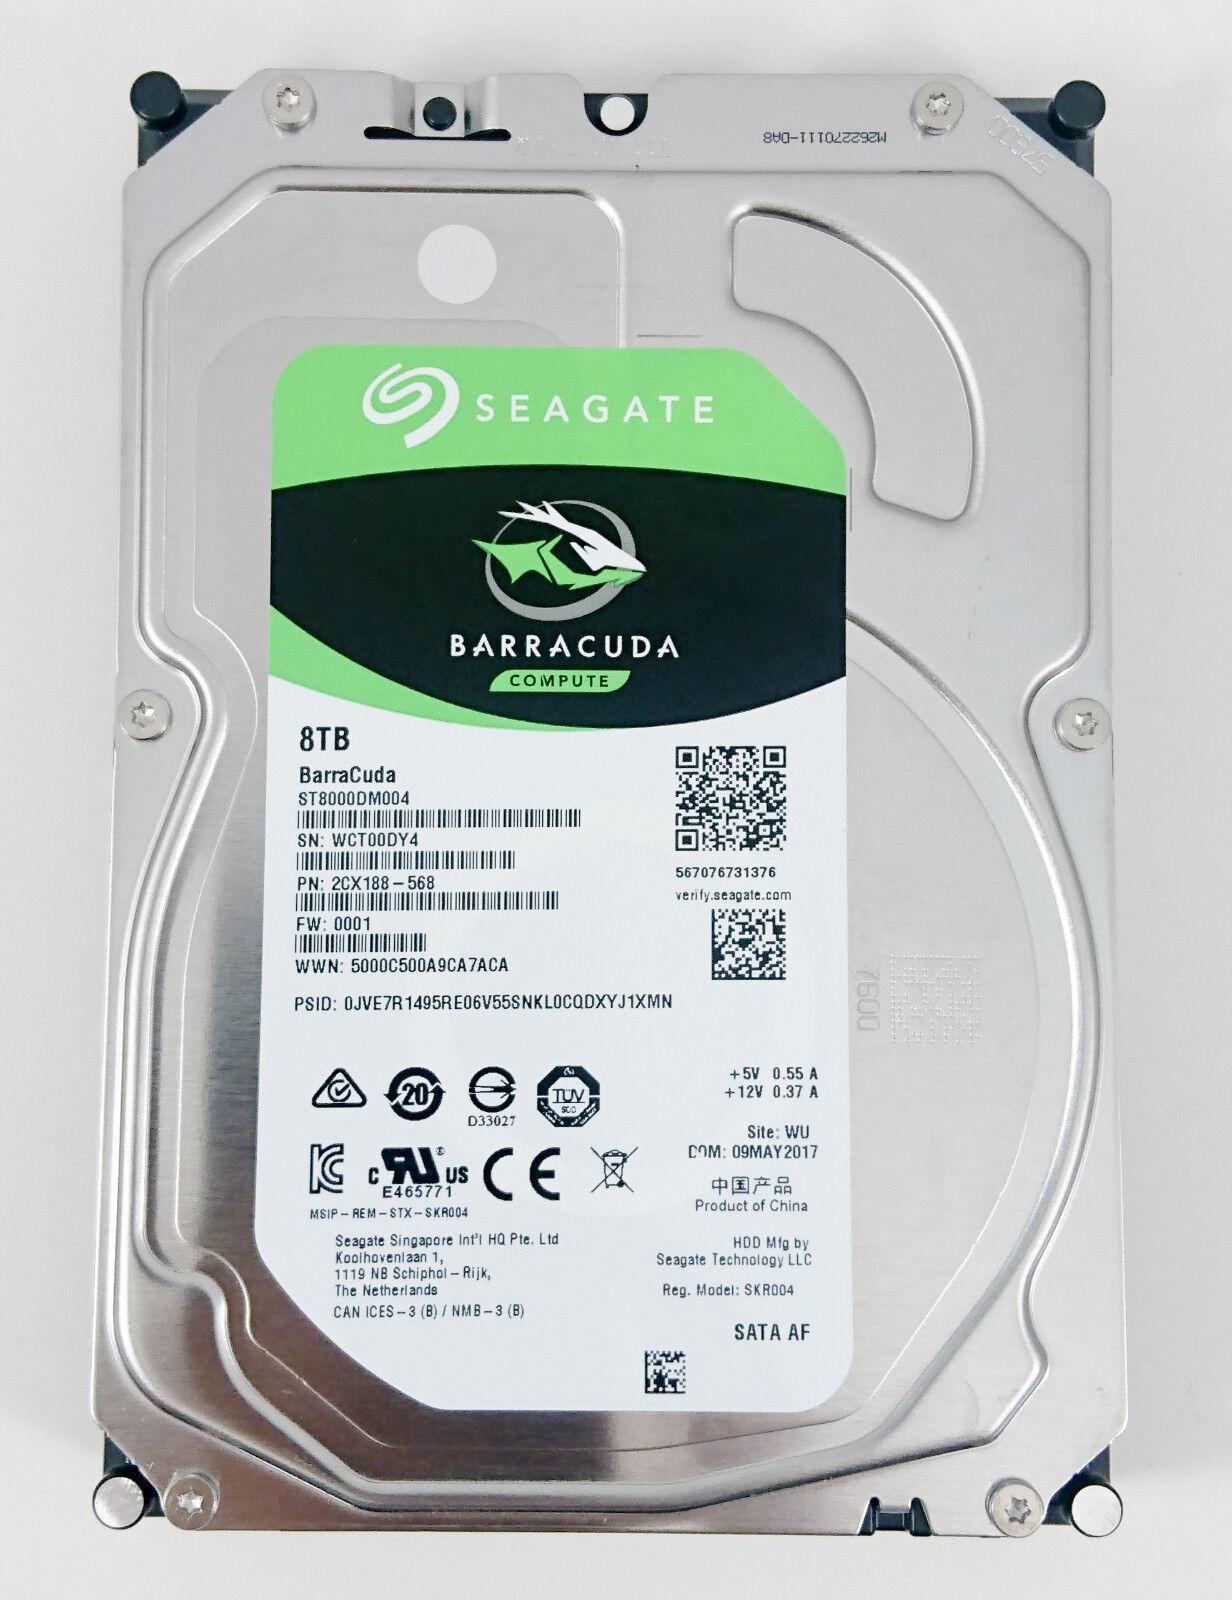 "Seagate Barracuda ST8000DM004 8 TB 7200RPM 256M 3.5"" SATA Desktop Hard Drive"